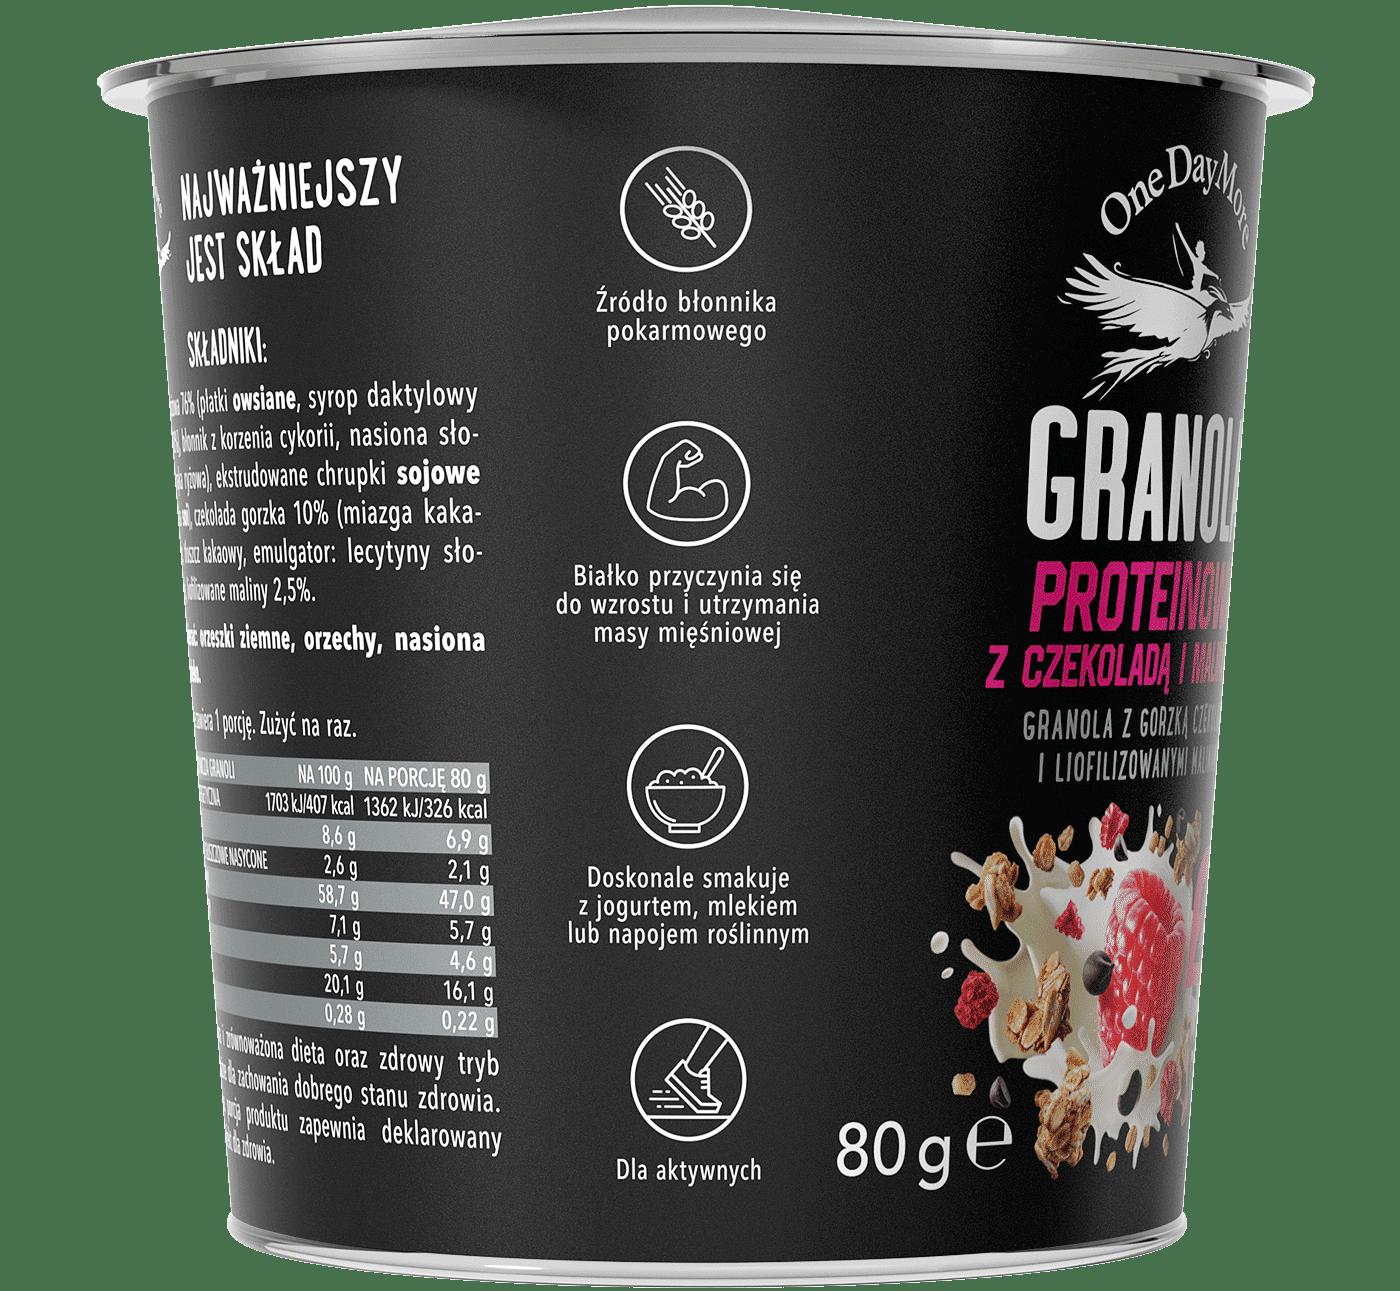 granola-proteinowa-zestaw-kubkow-bok-onedaymore-1400×1291